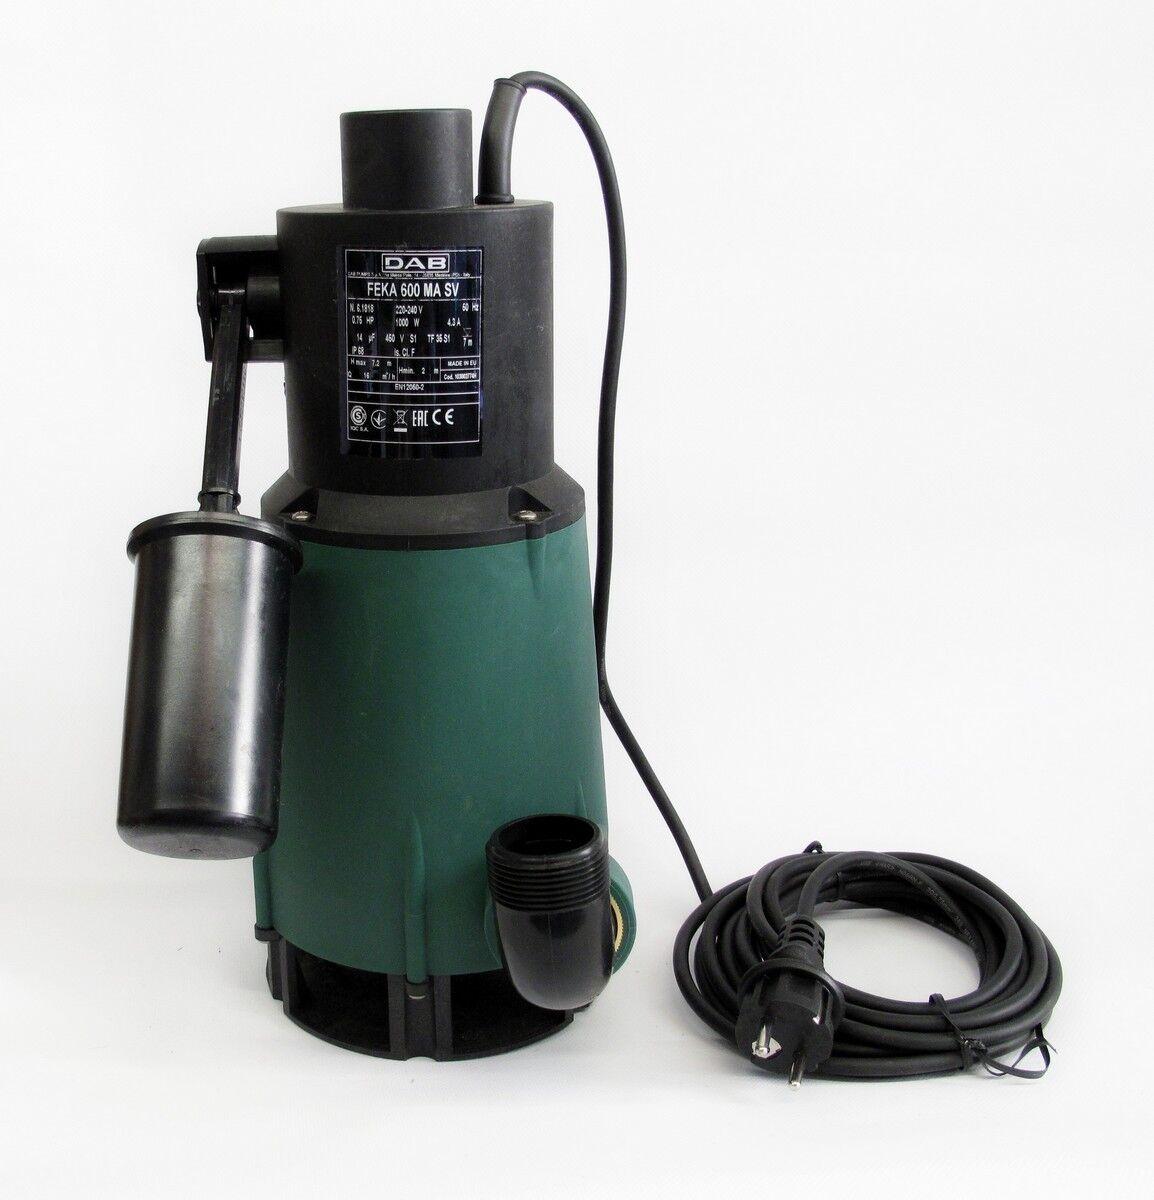 DAB FEKA 600 M-A SV Tauch Schmutzwasserpumpe DA114